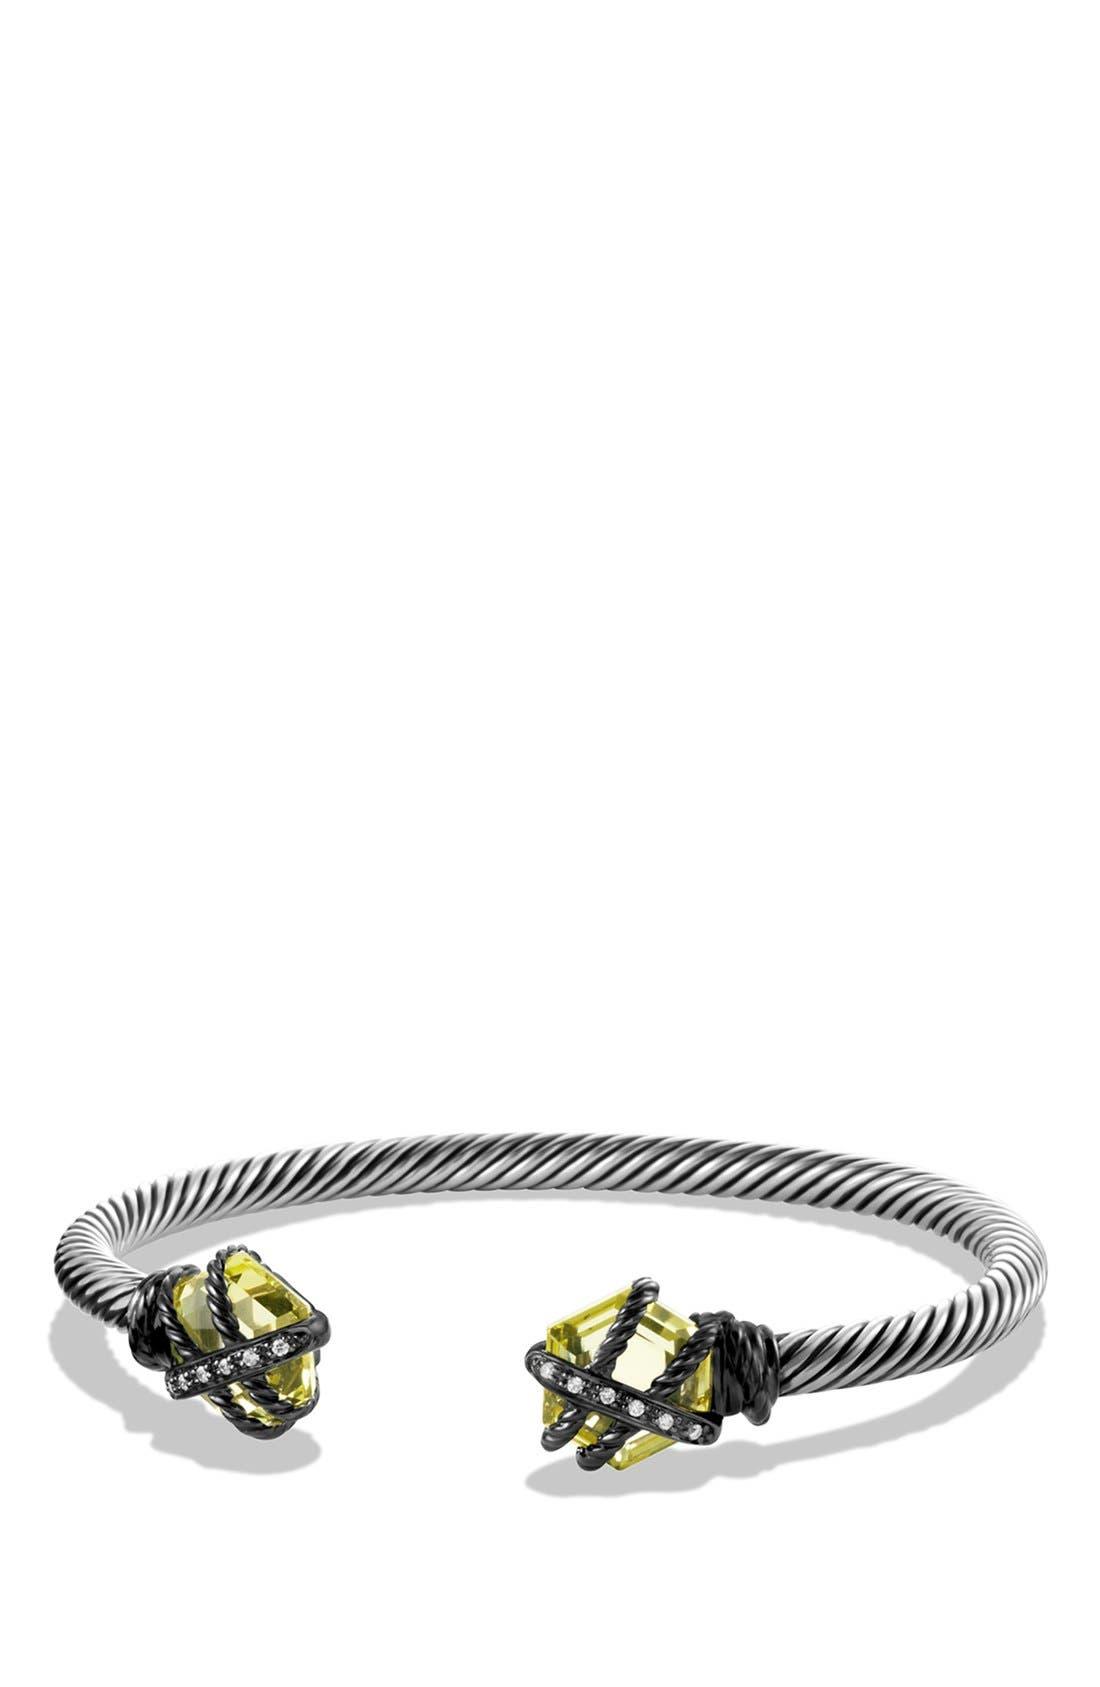 Main Image - David Yurman 'Cable Wrap' Bracelet with Lemon Citrine and Diamonds